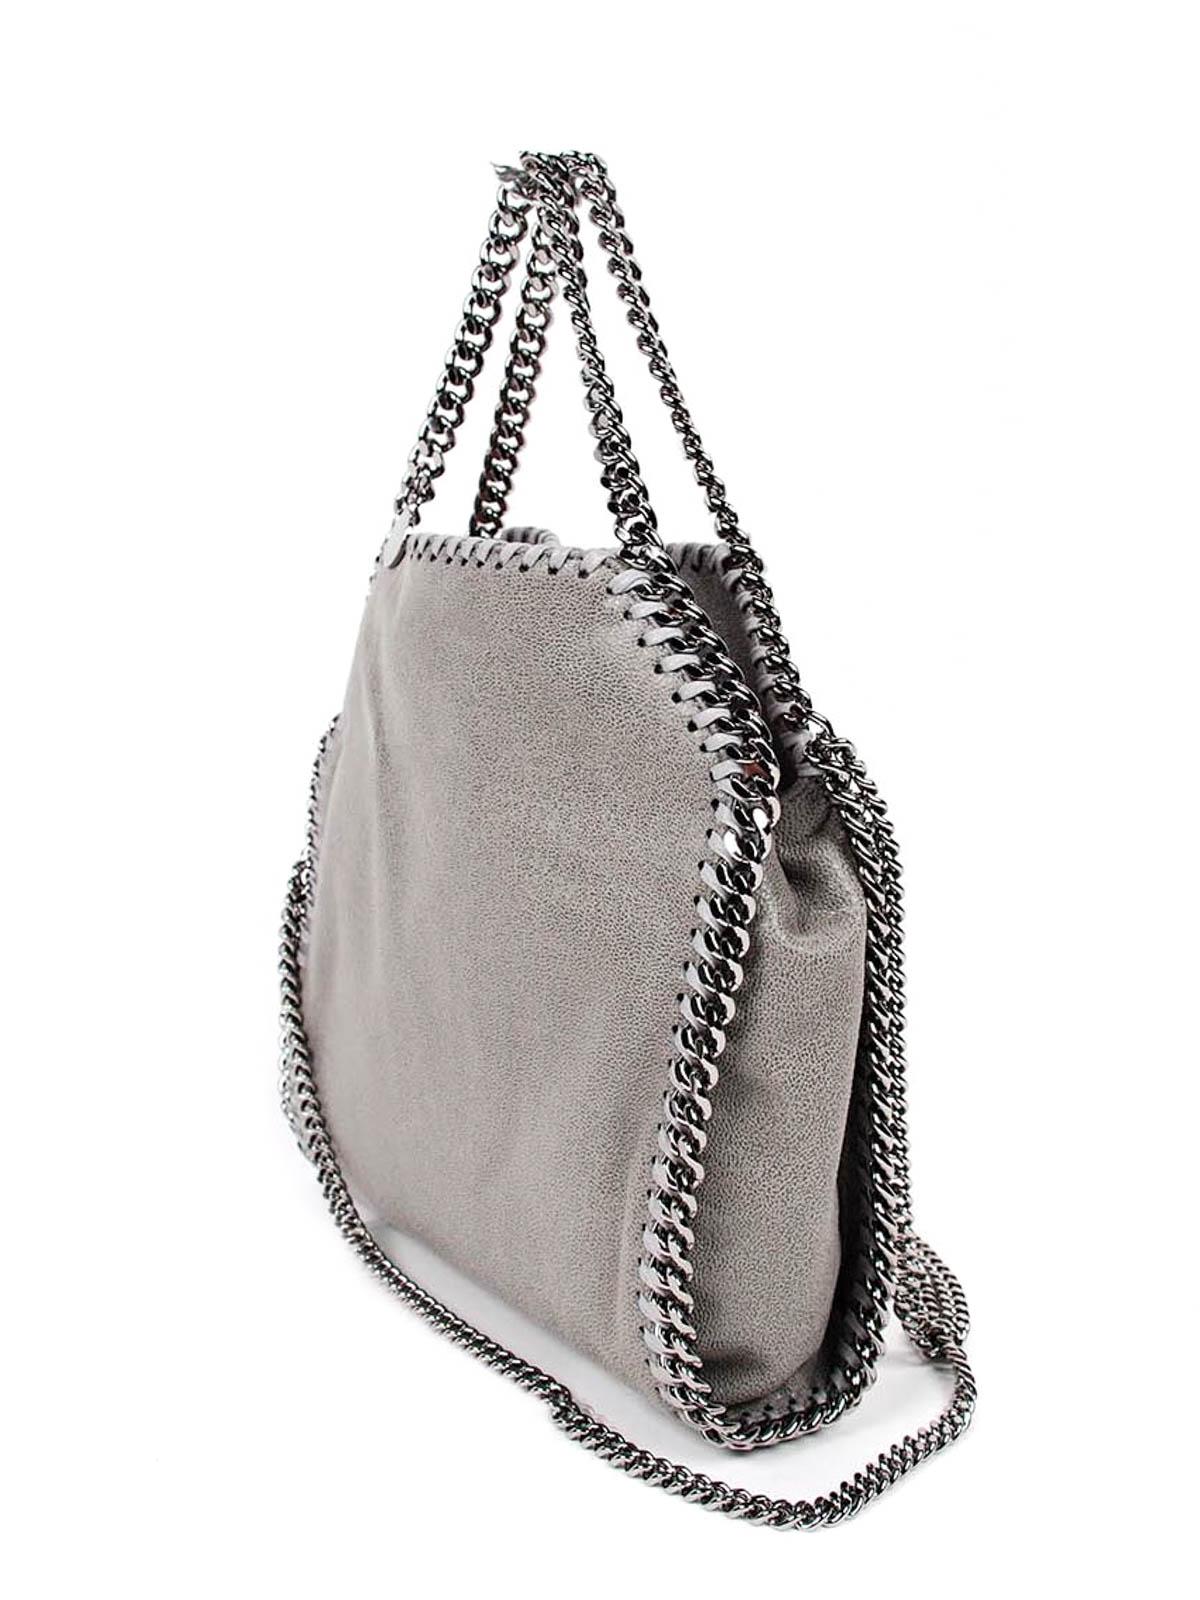 Stella Mccartney - Falabella mini tote - totes bags - 371223W91321220 16c225a623567